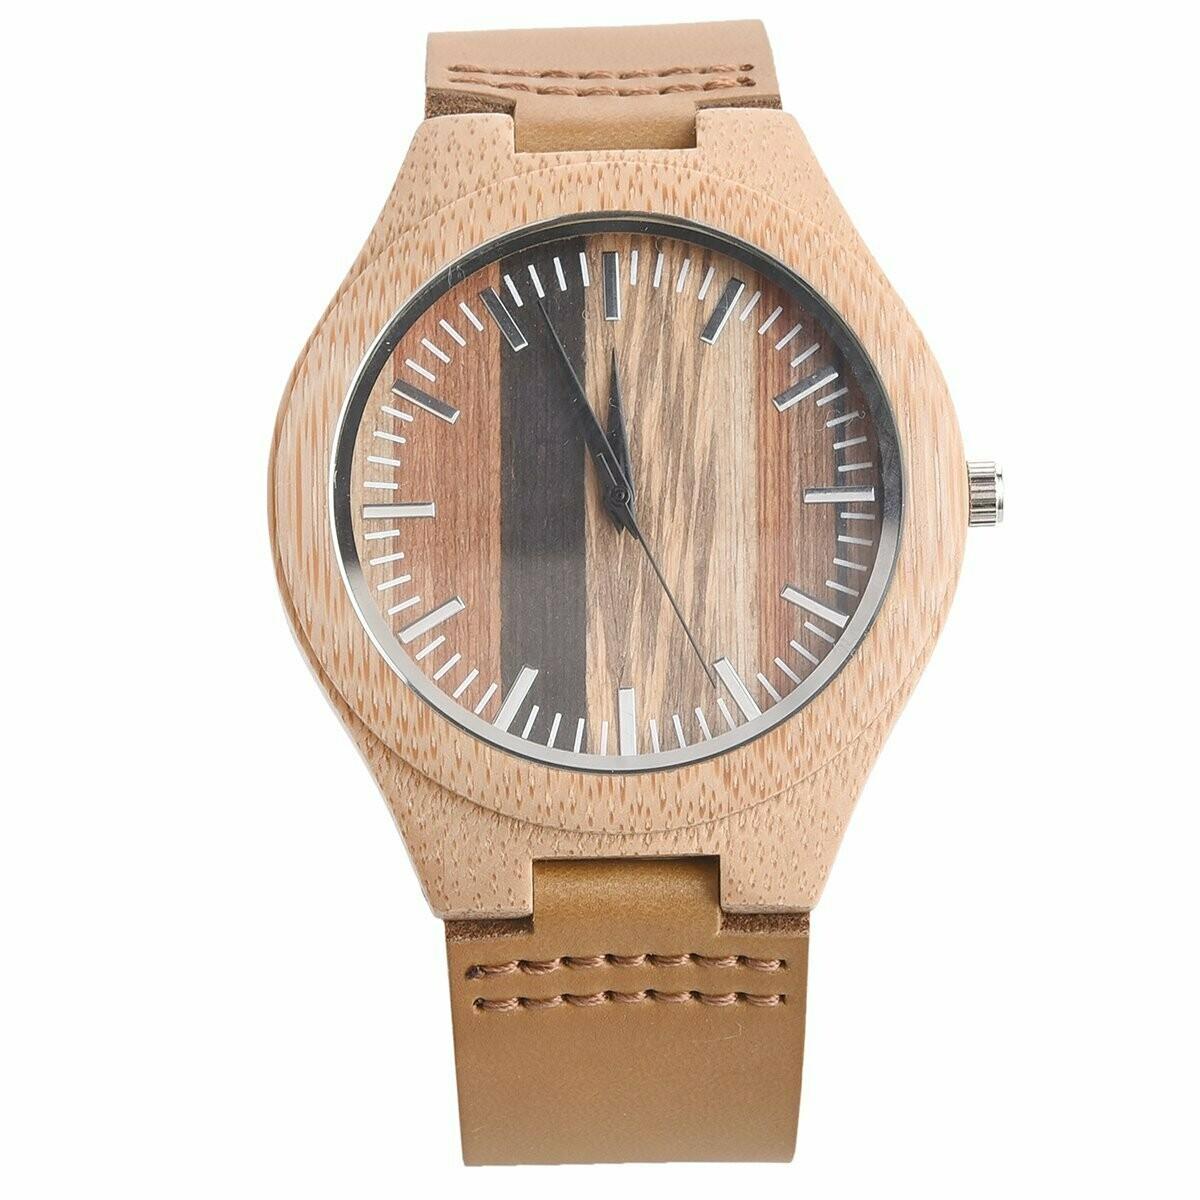 Nova Bamboo Watch #3051C